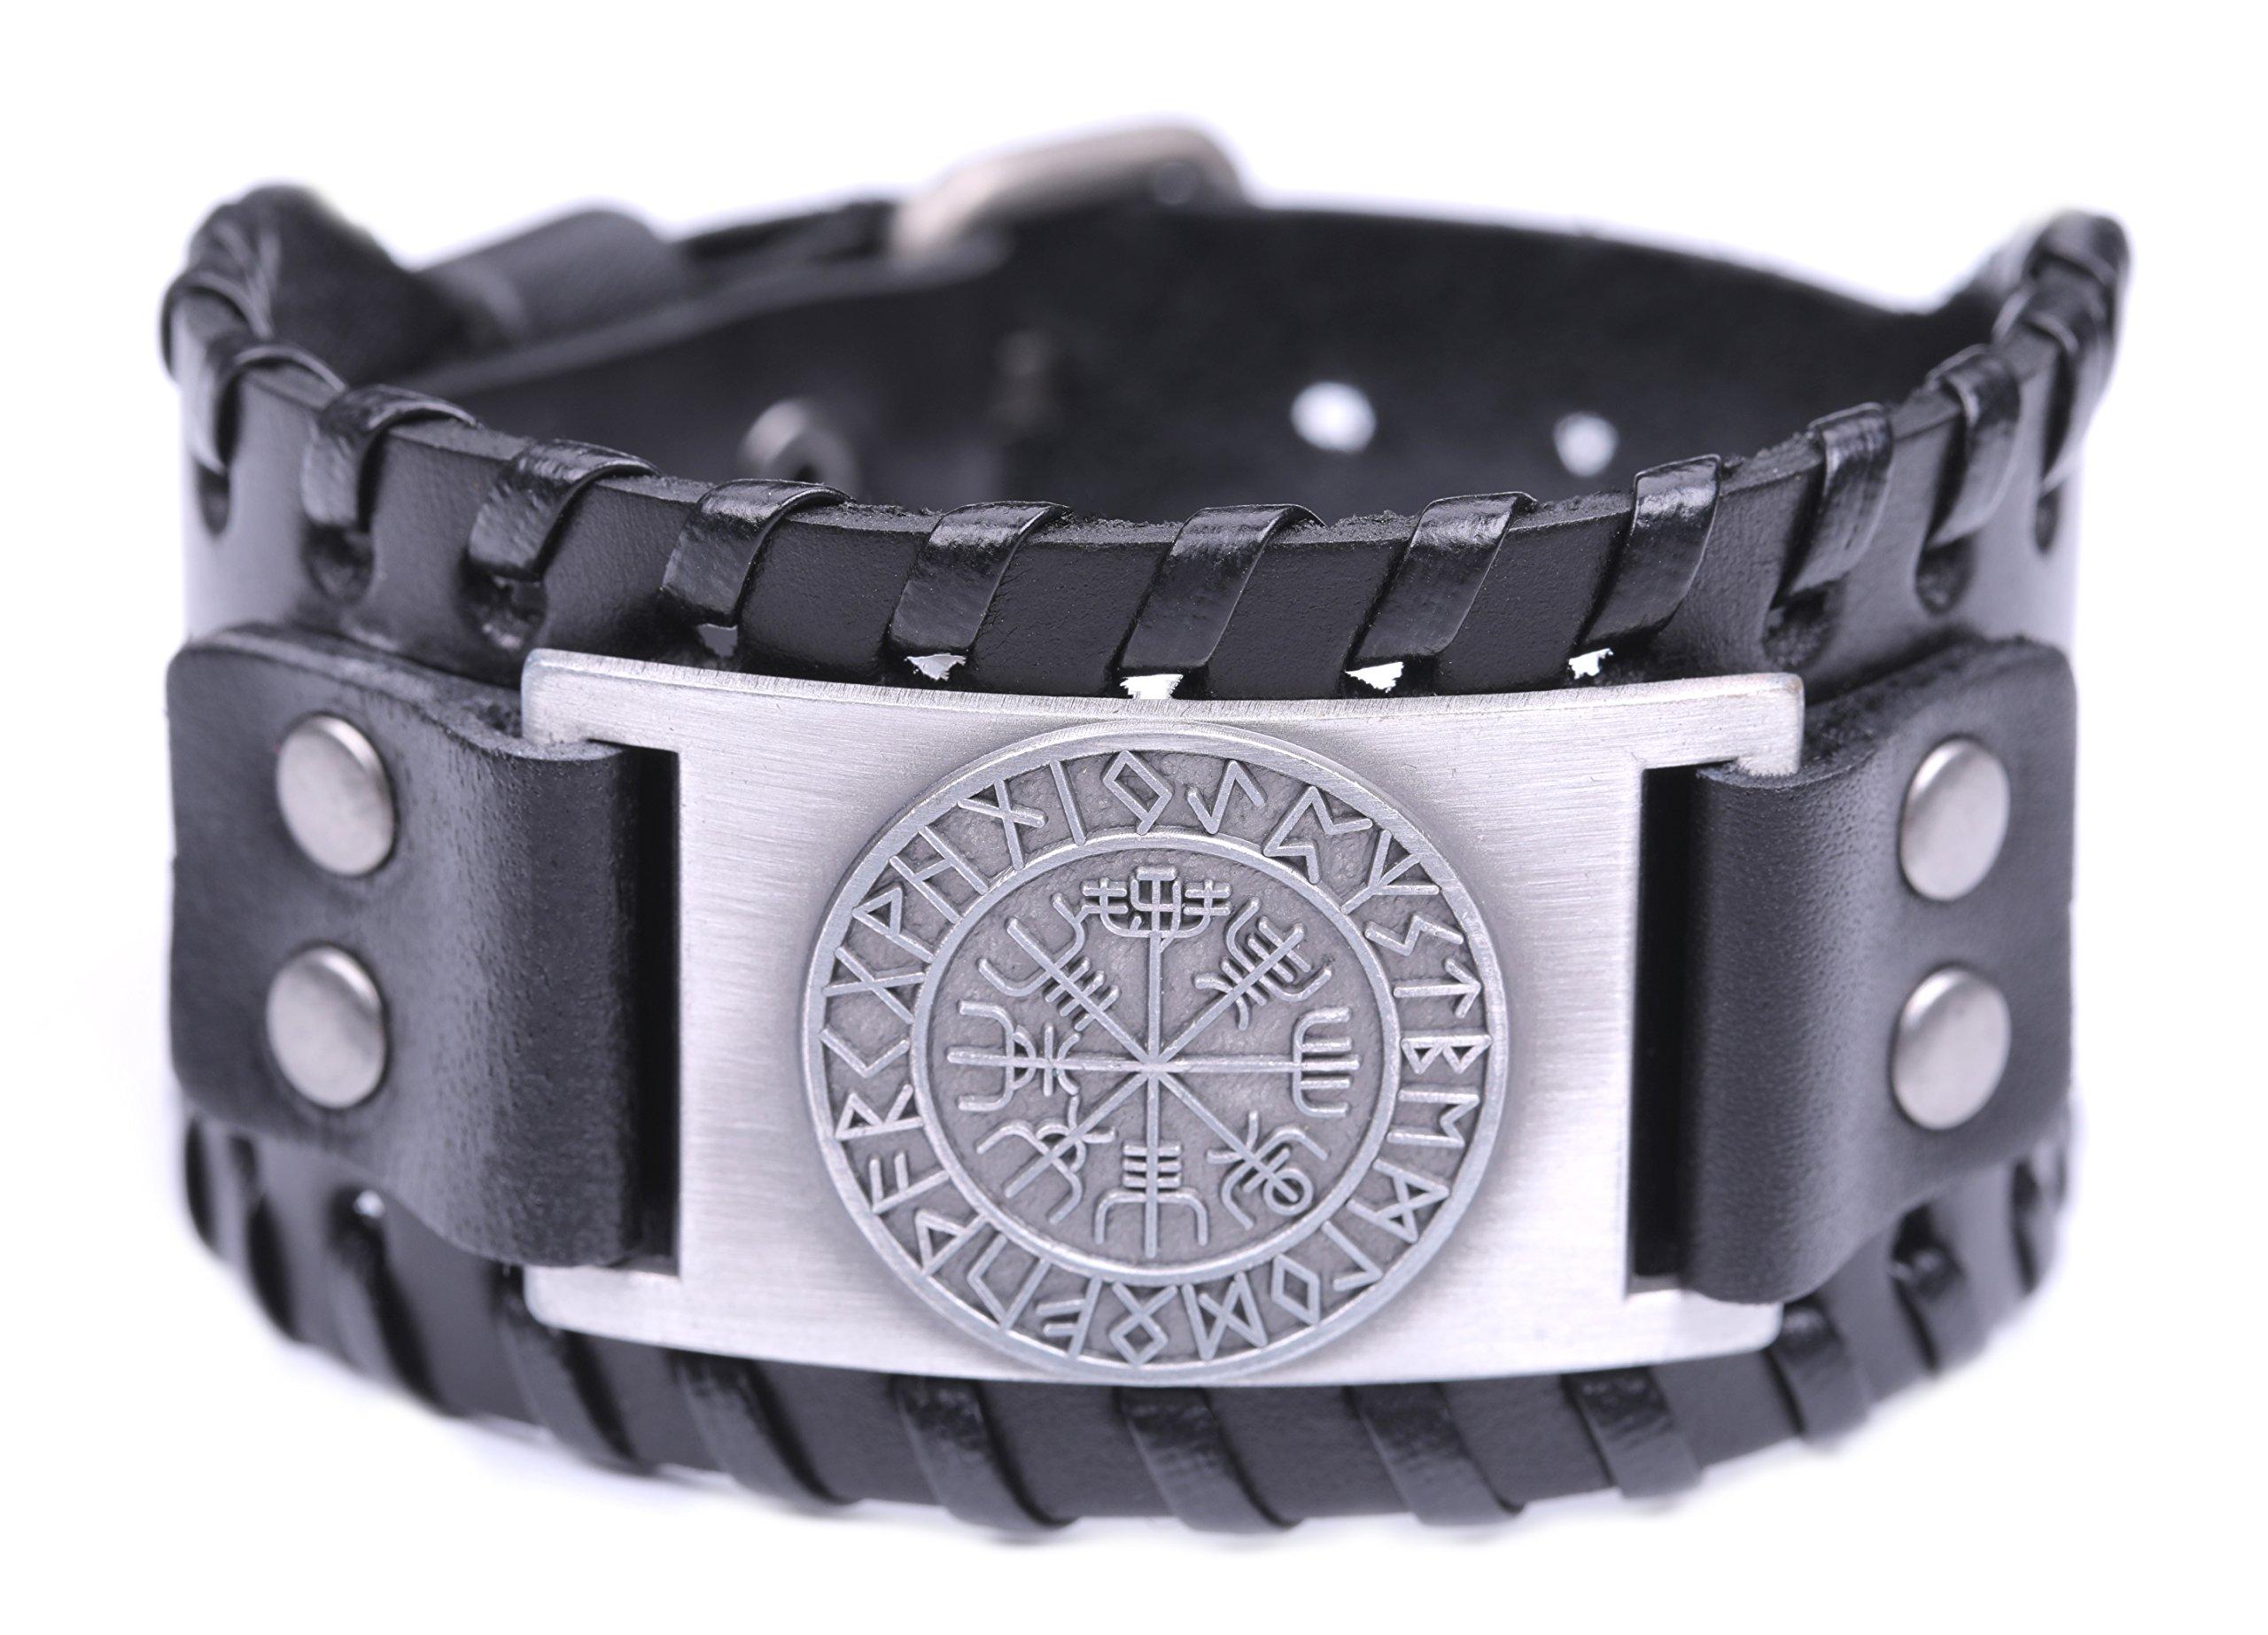 VASSAGO Vintage Nordic Viking Runes Wicca Vegvisir Compass Charm Cuff New-style Belt Buckle Bracelet (Black Leather, Antique Silver)